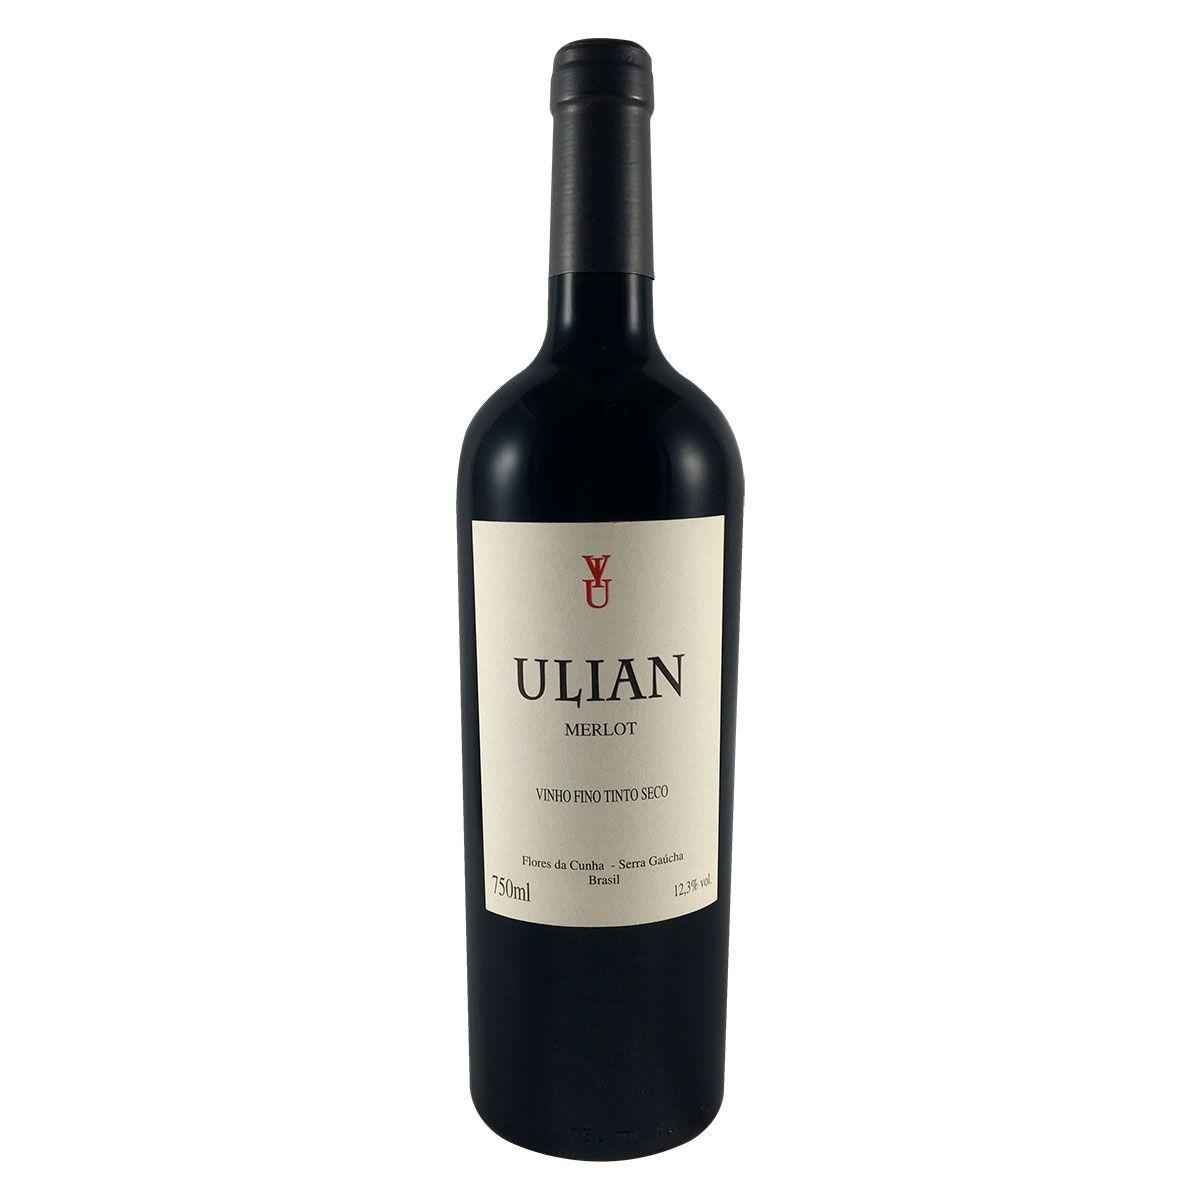 Vinho Tinto Fino Ulian Merlot 750ml